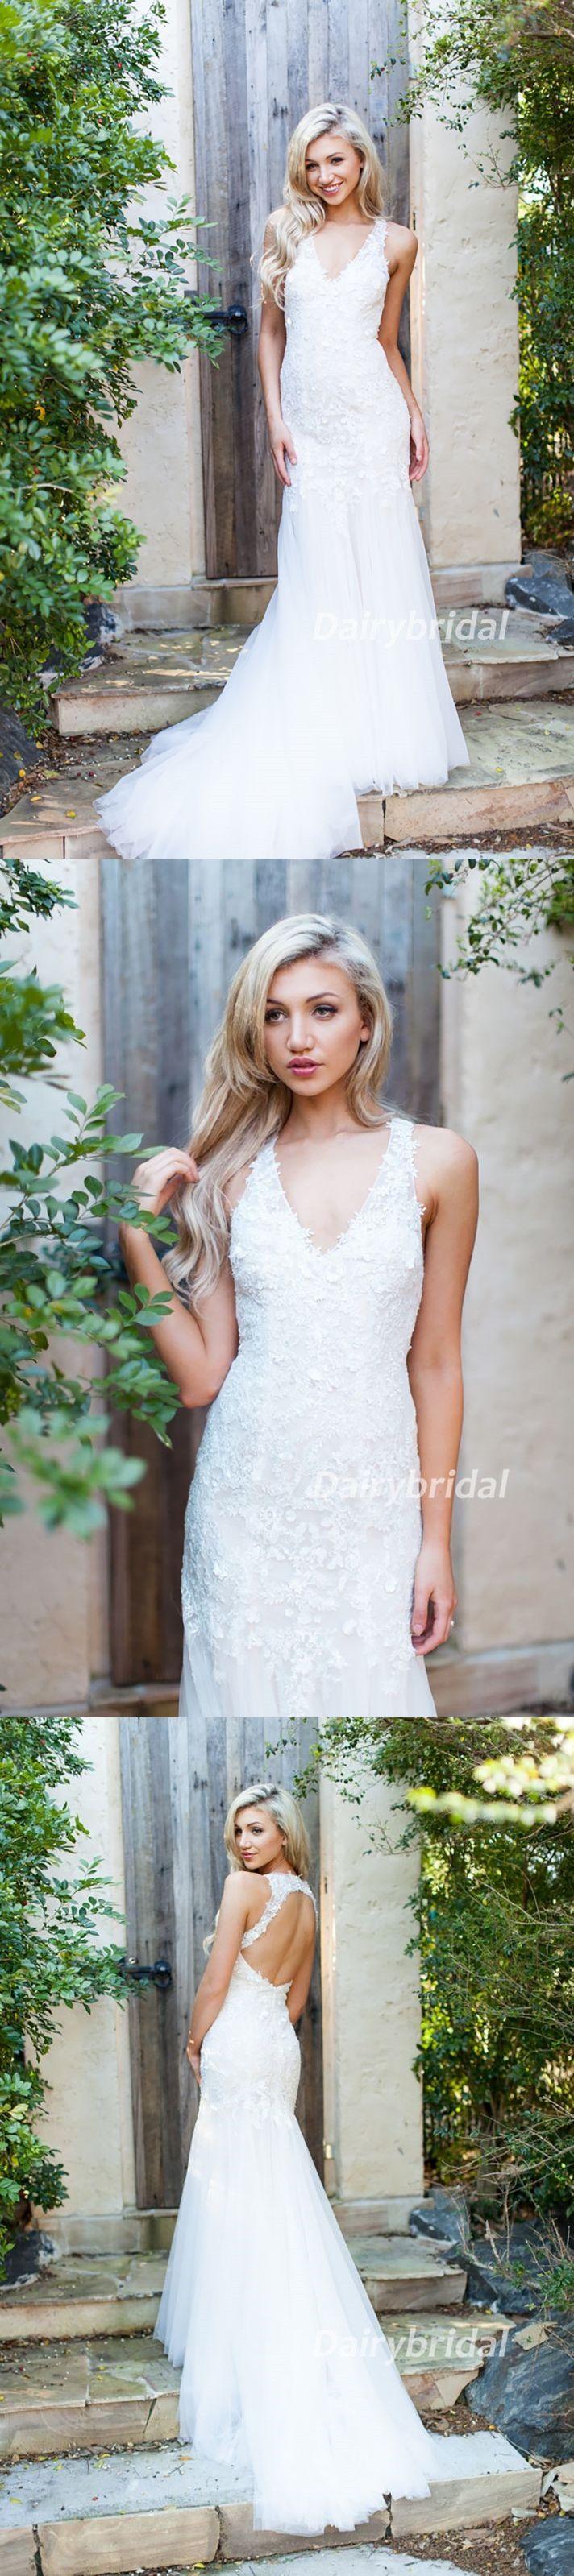 Lace wedding dress open back mermaid  Lace Wedding Dress Sleeveless Wedding Dress OpenBack Bridal Dress